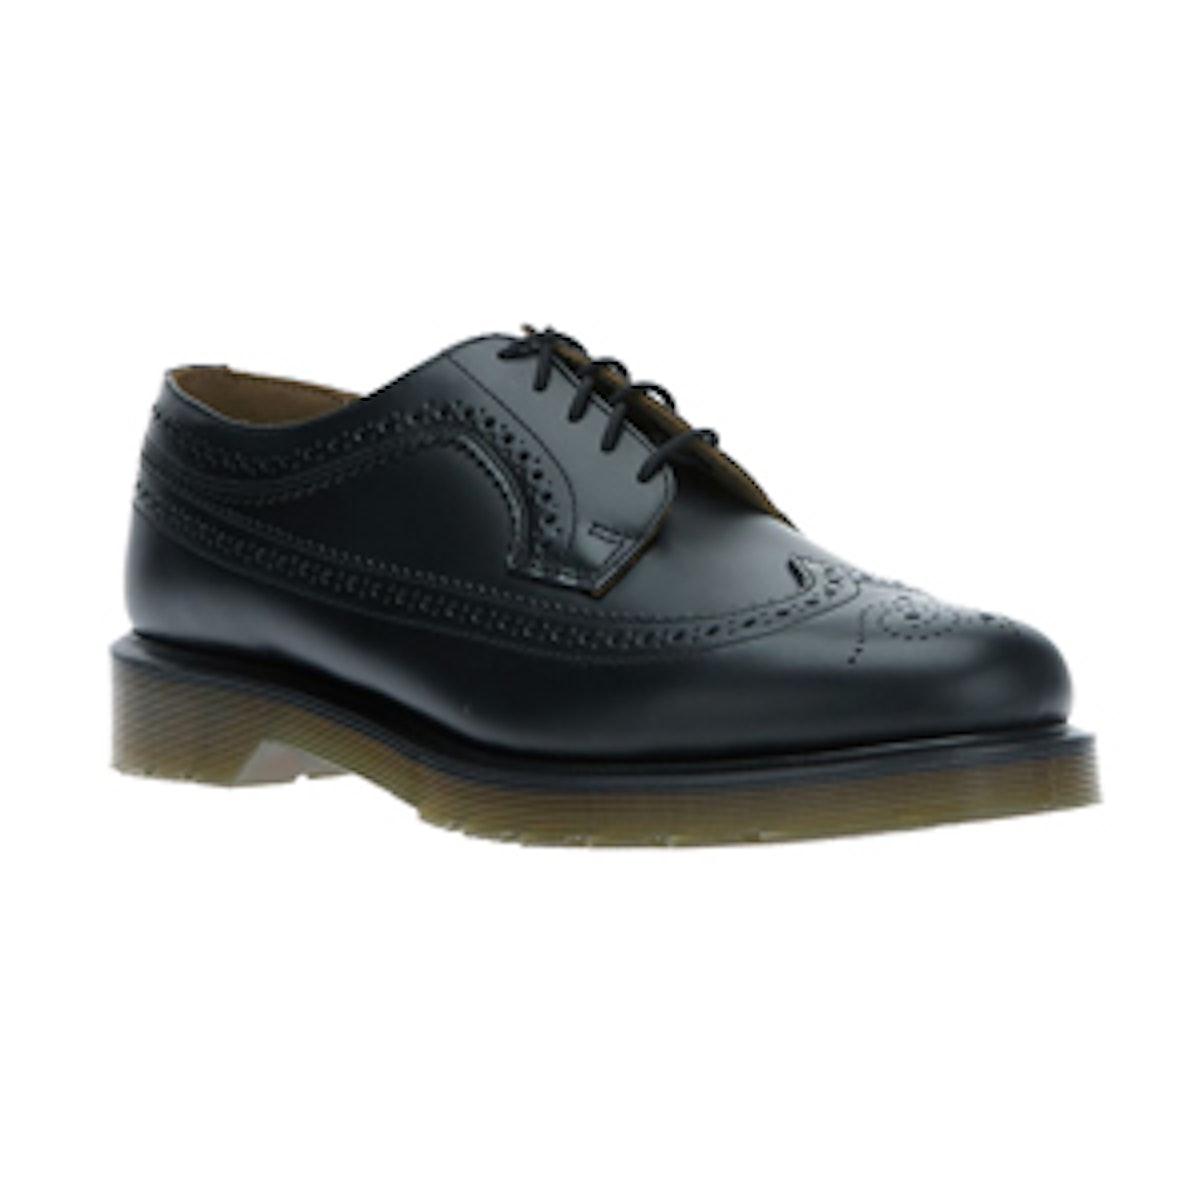 3989 Brogue Shoe